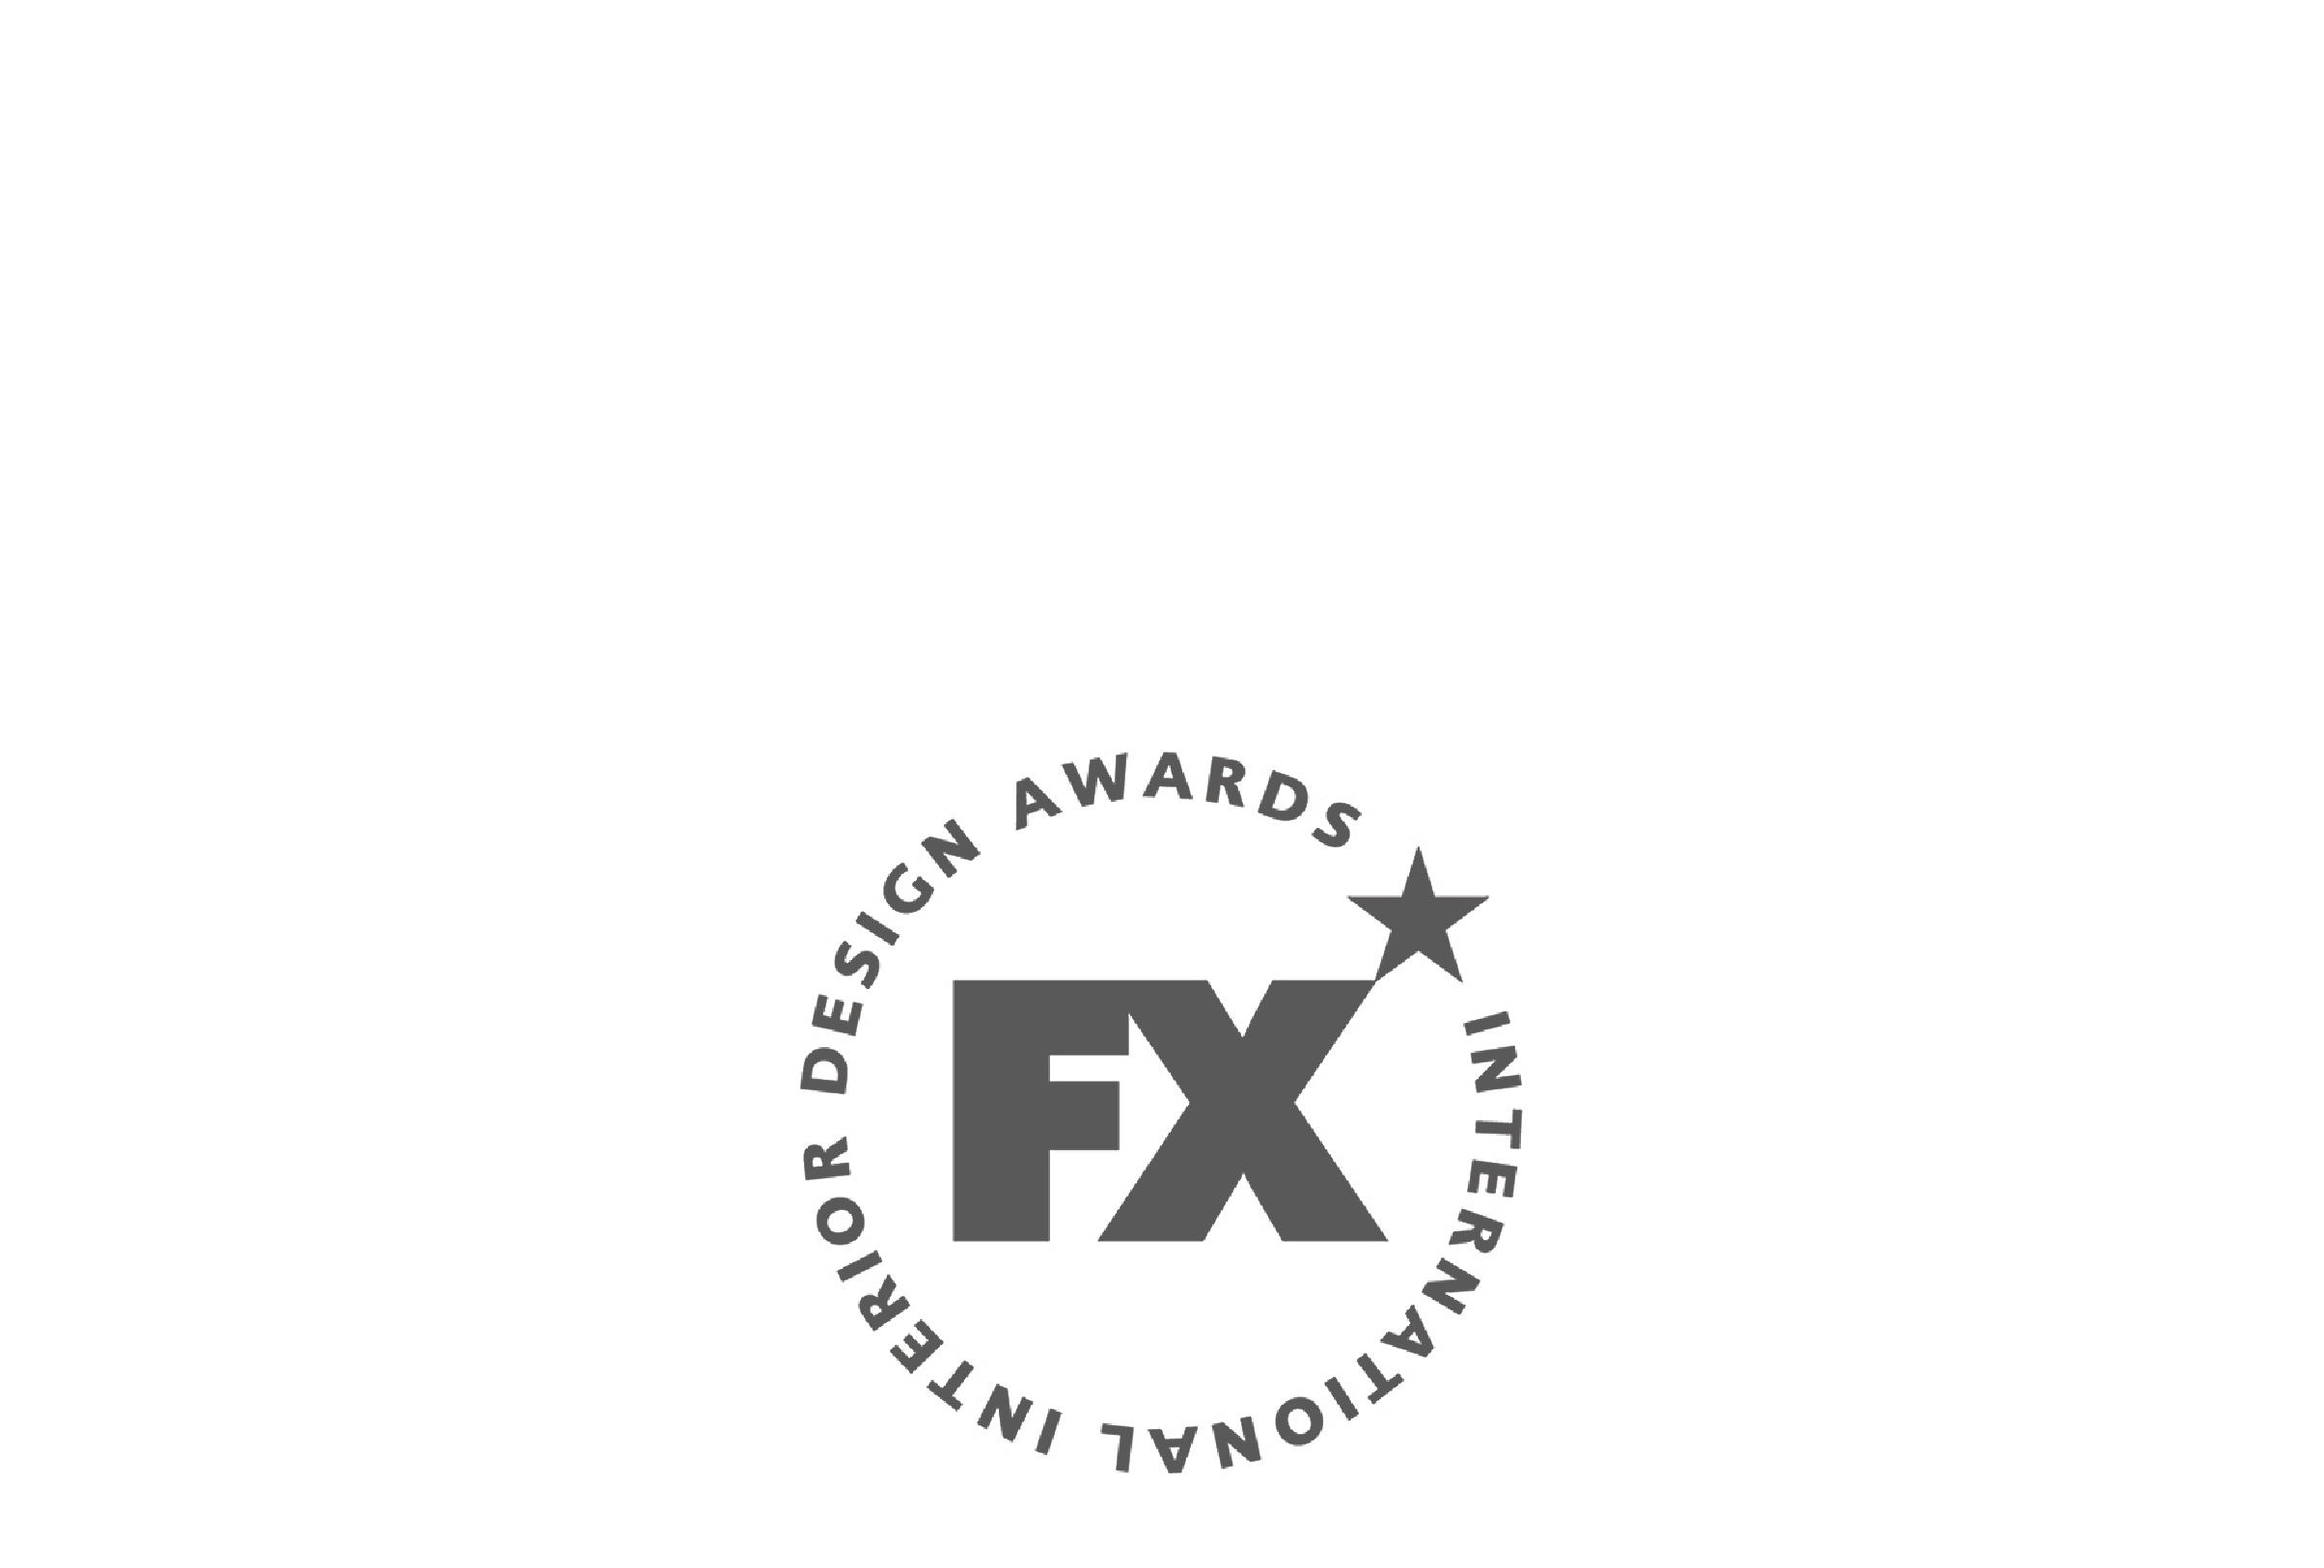 JHP Award Logos-06-BW.jpg